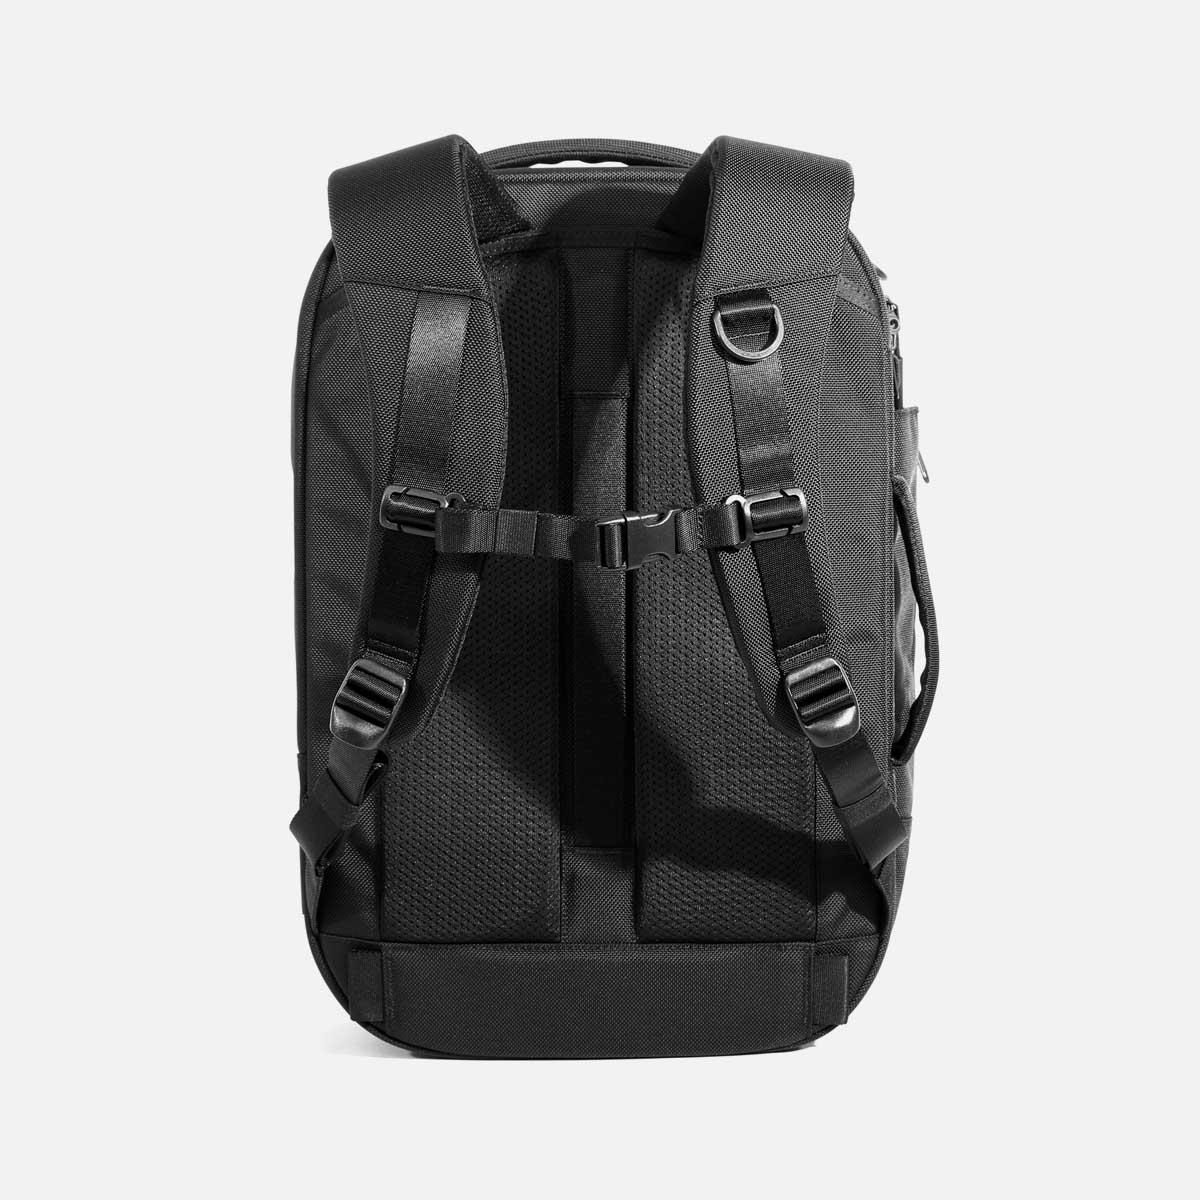 AER21022_travelpack2small_back.jpg